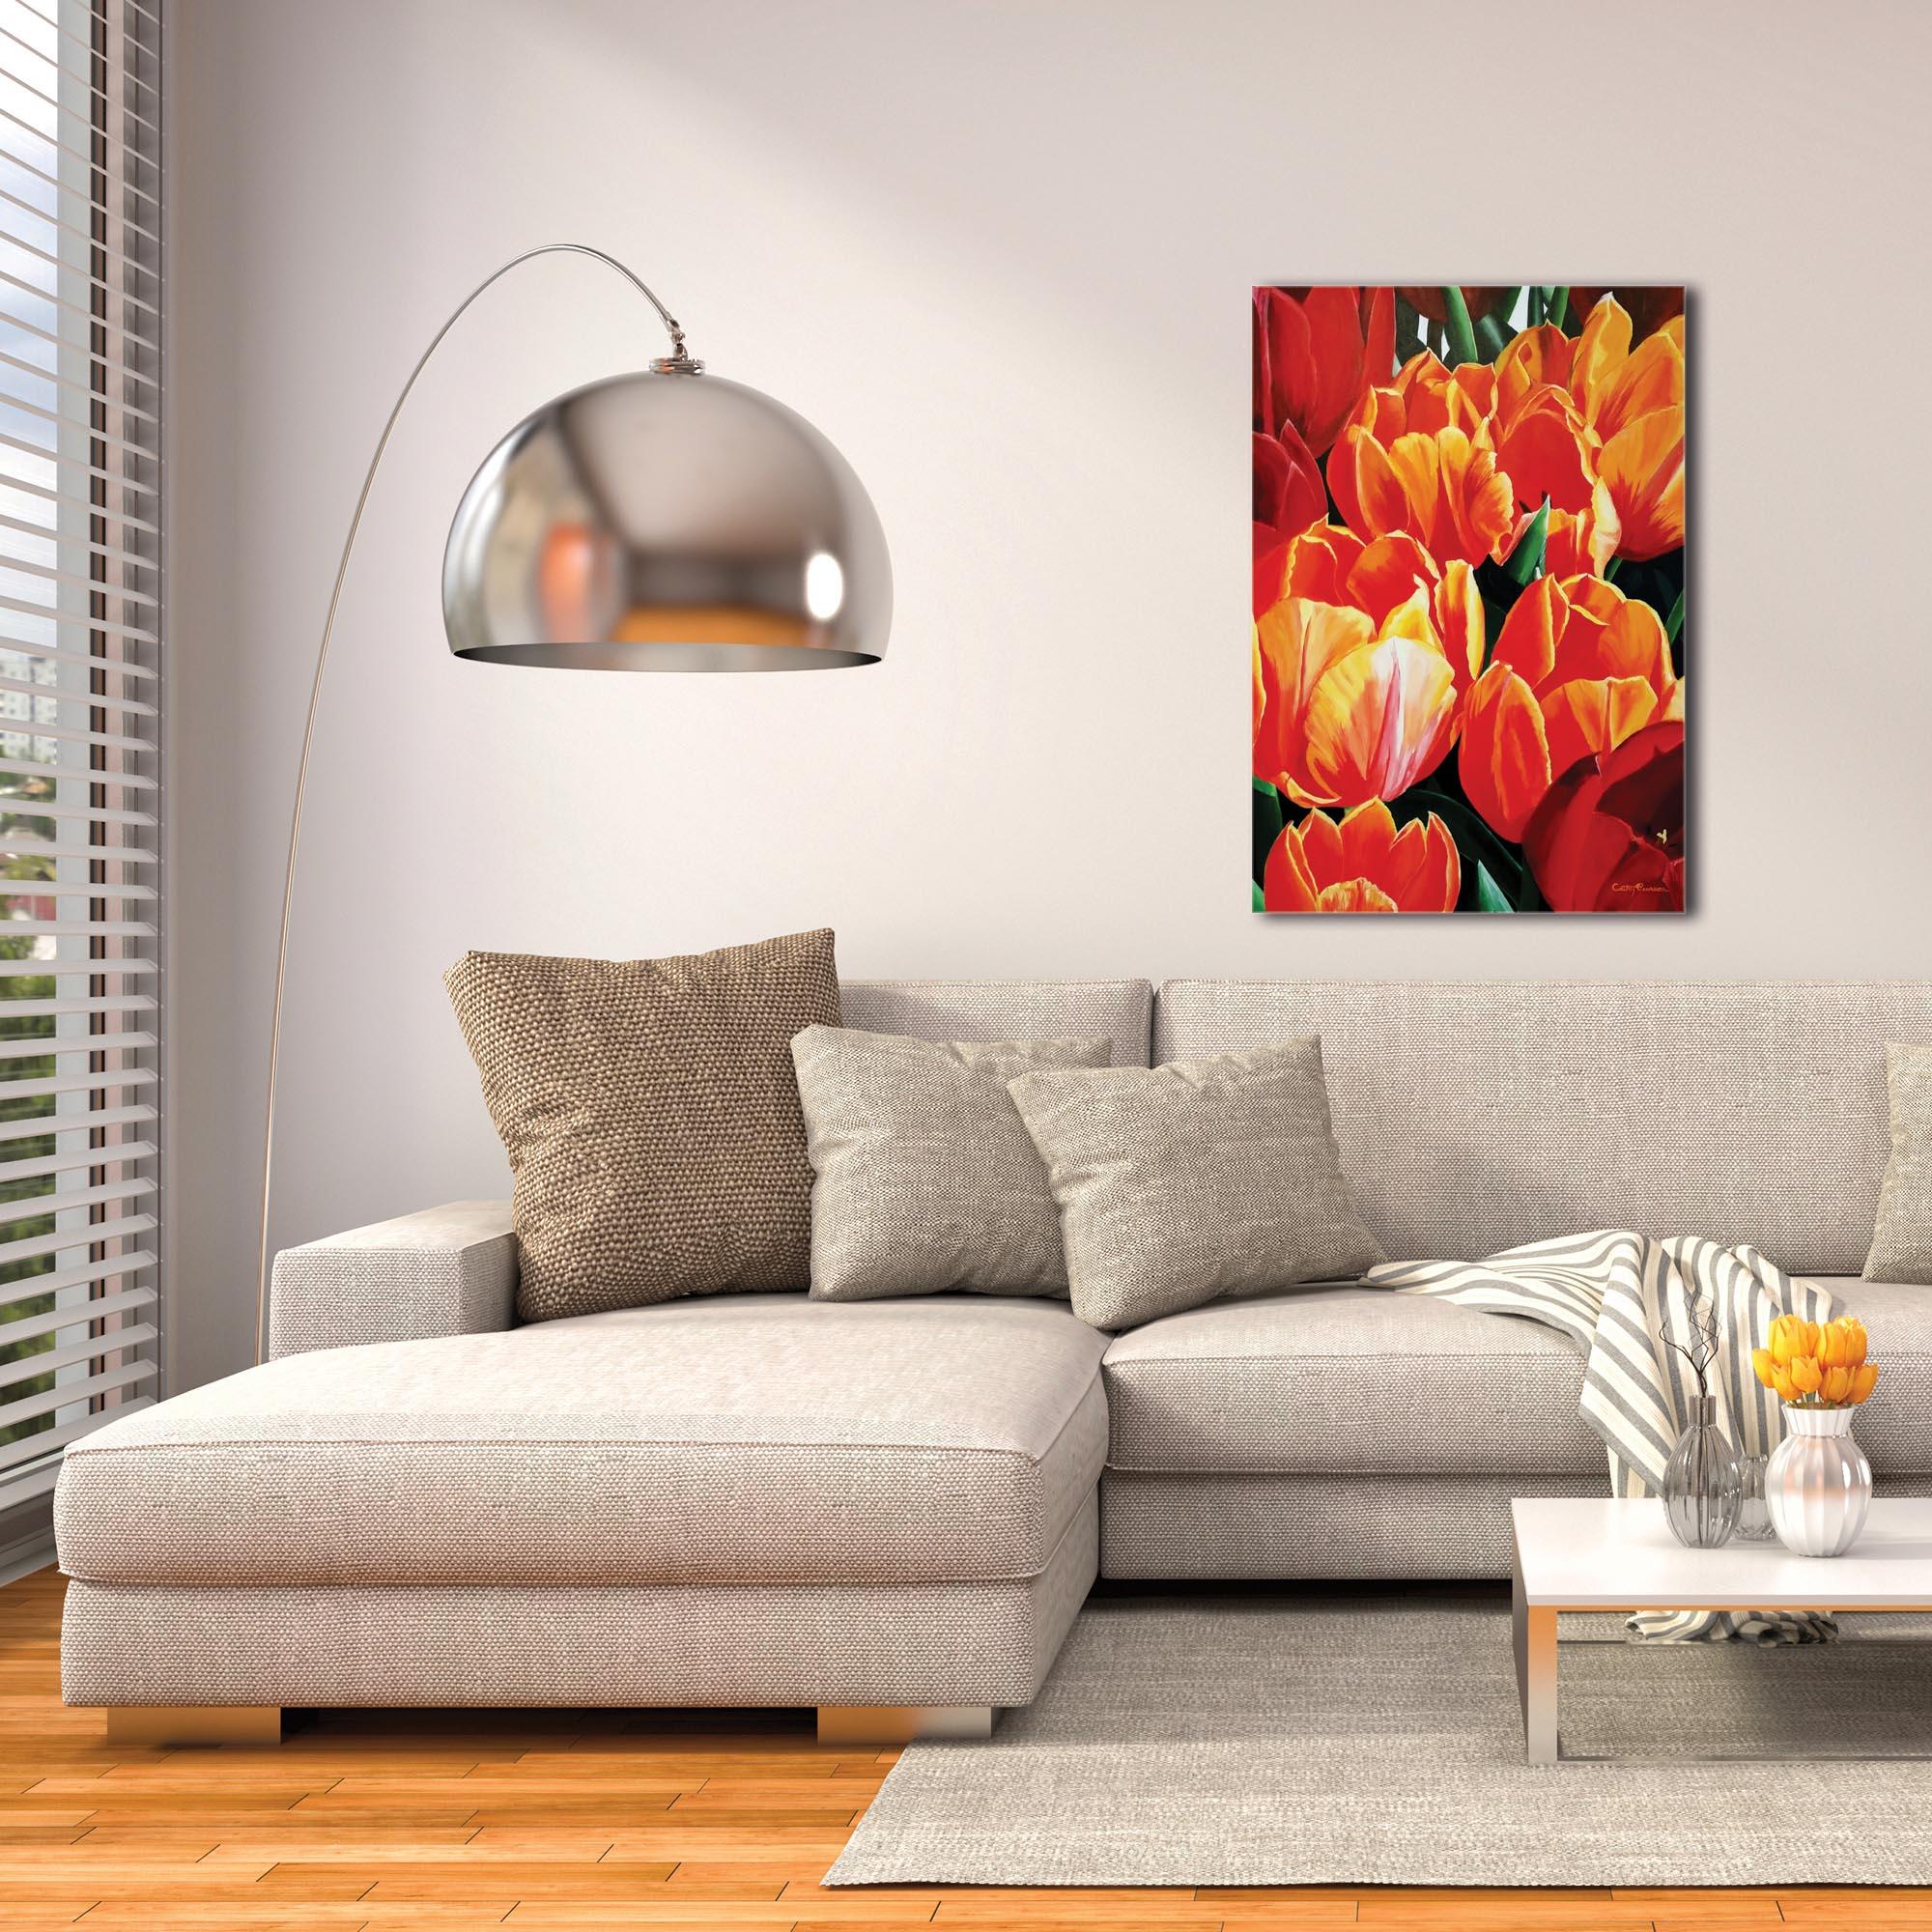 Traditional Wall Art 'Tulip Bonanza' - Floral Decor on Metal or Plexiglass - Image 3